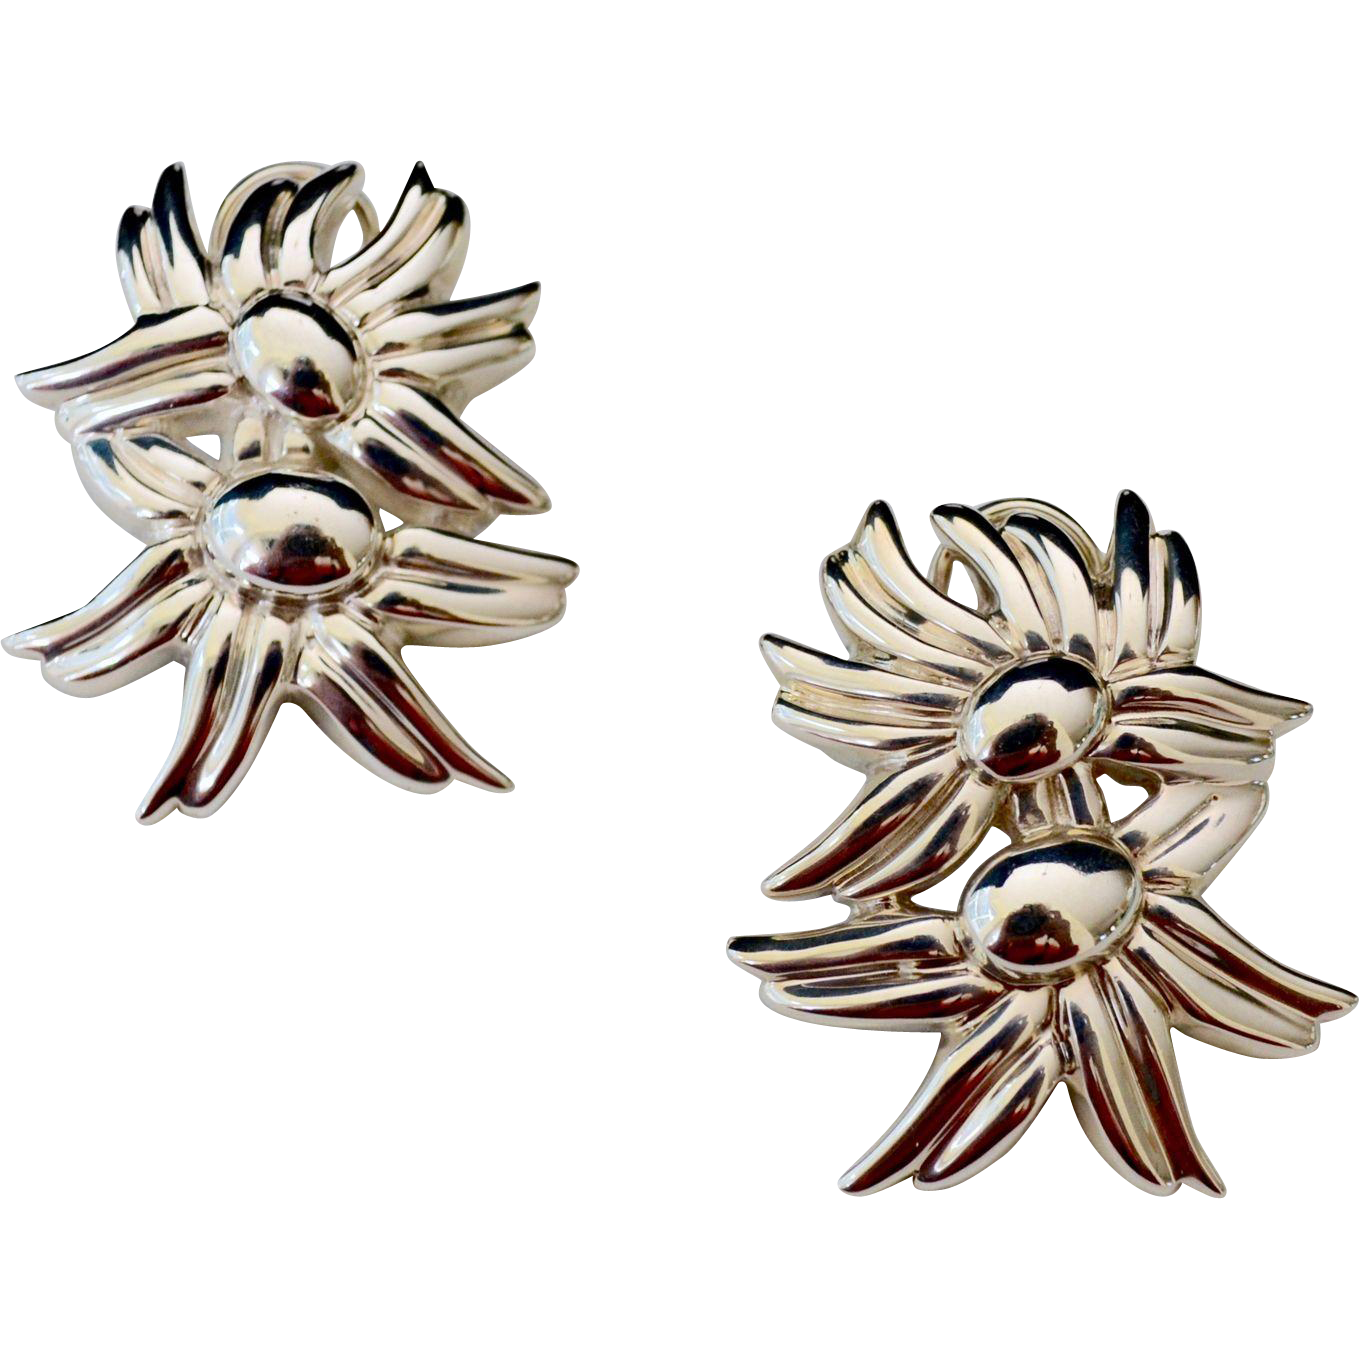 Vintage Tiffany & Co Sterling Silver Marigold Cluster Pierced Earrings